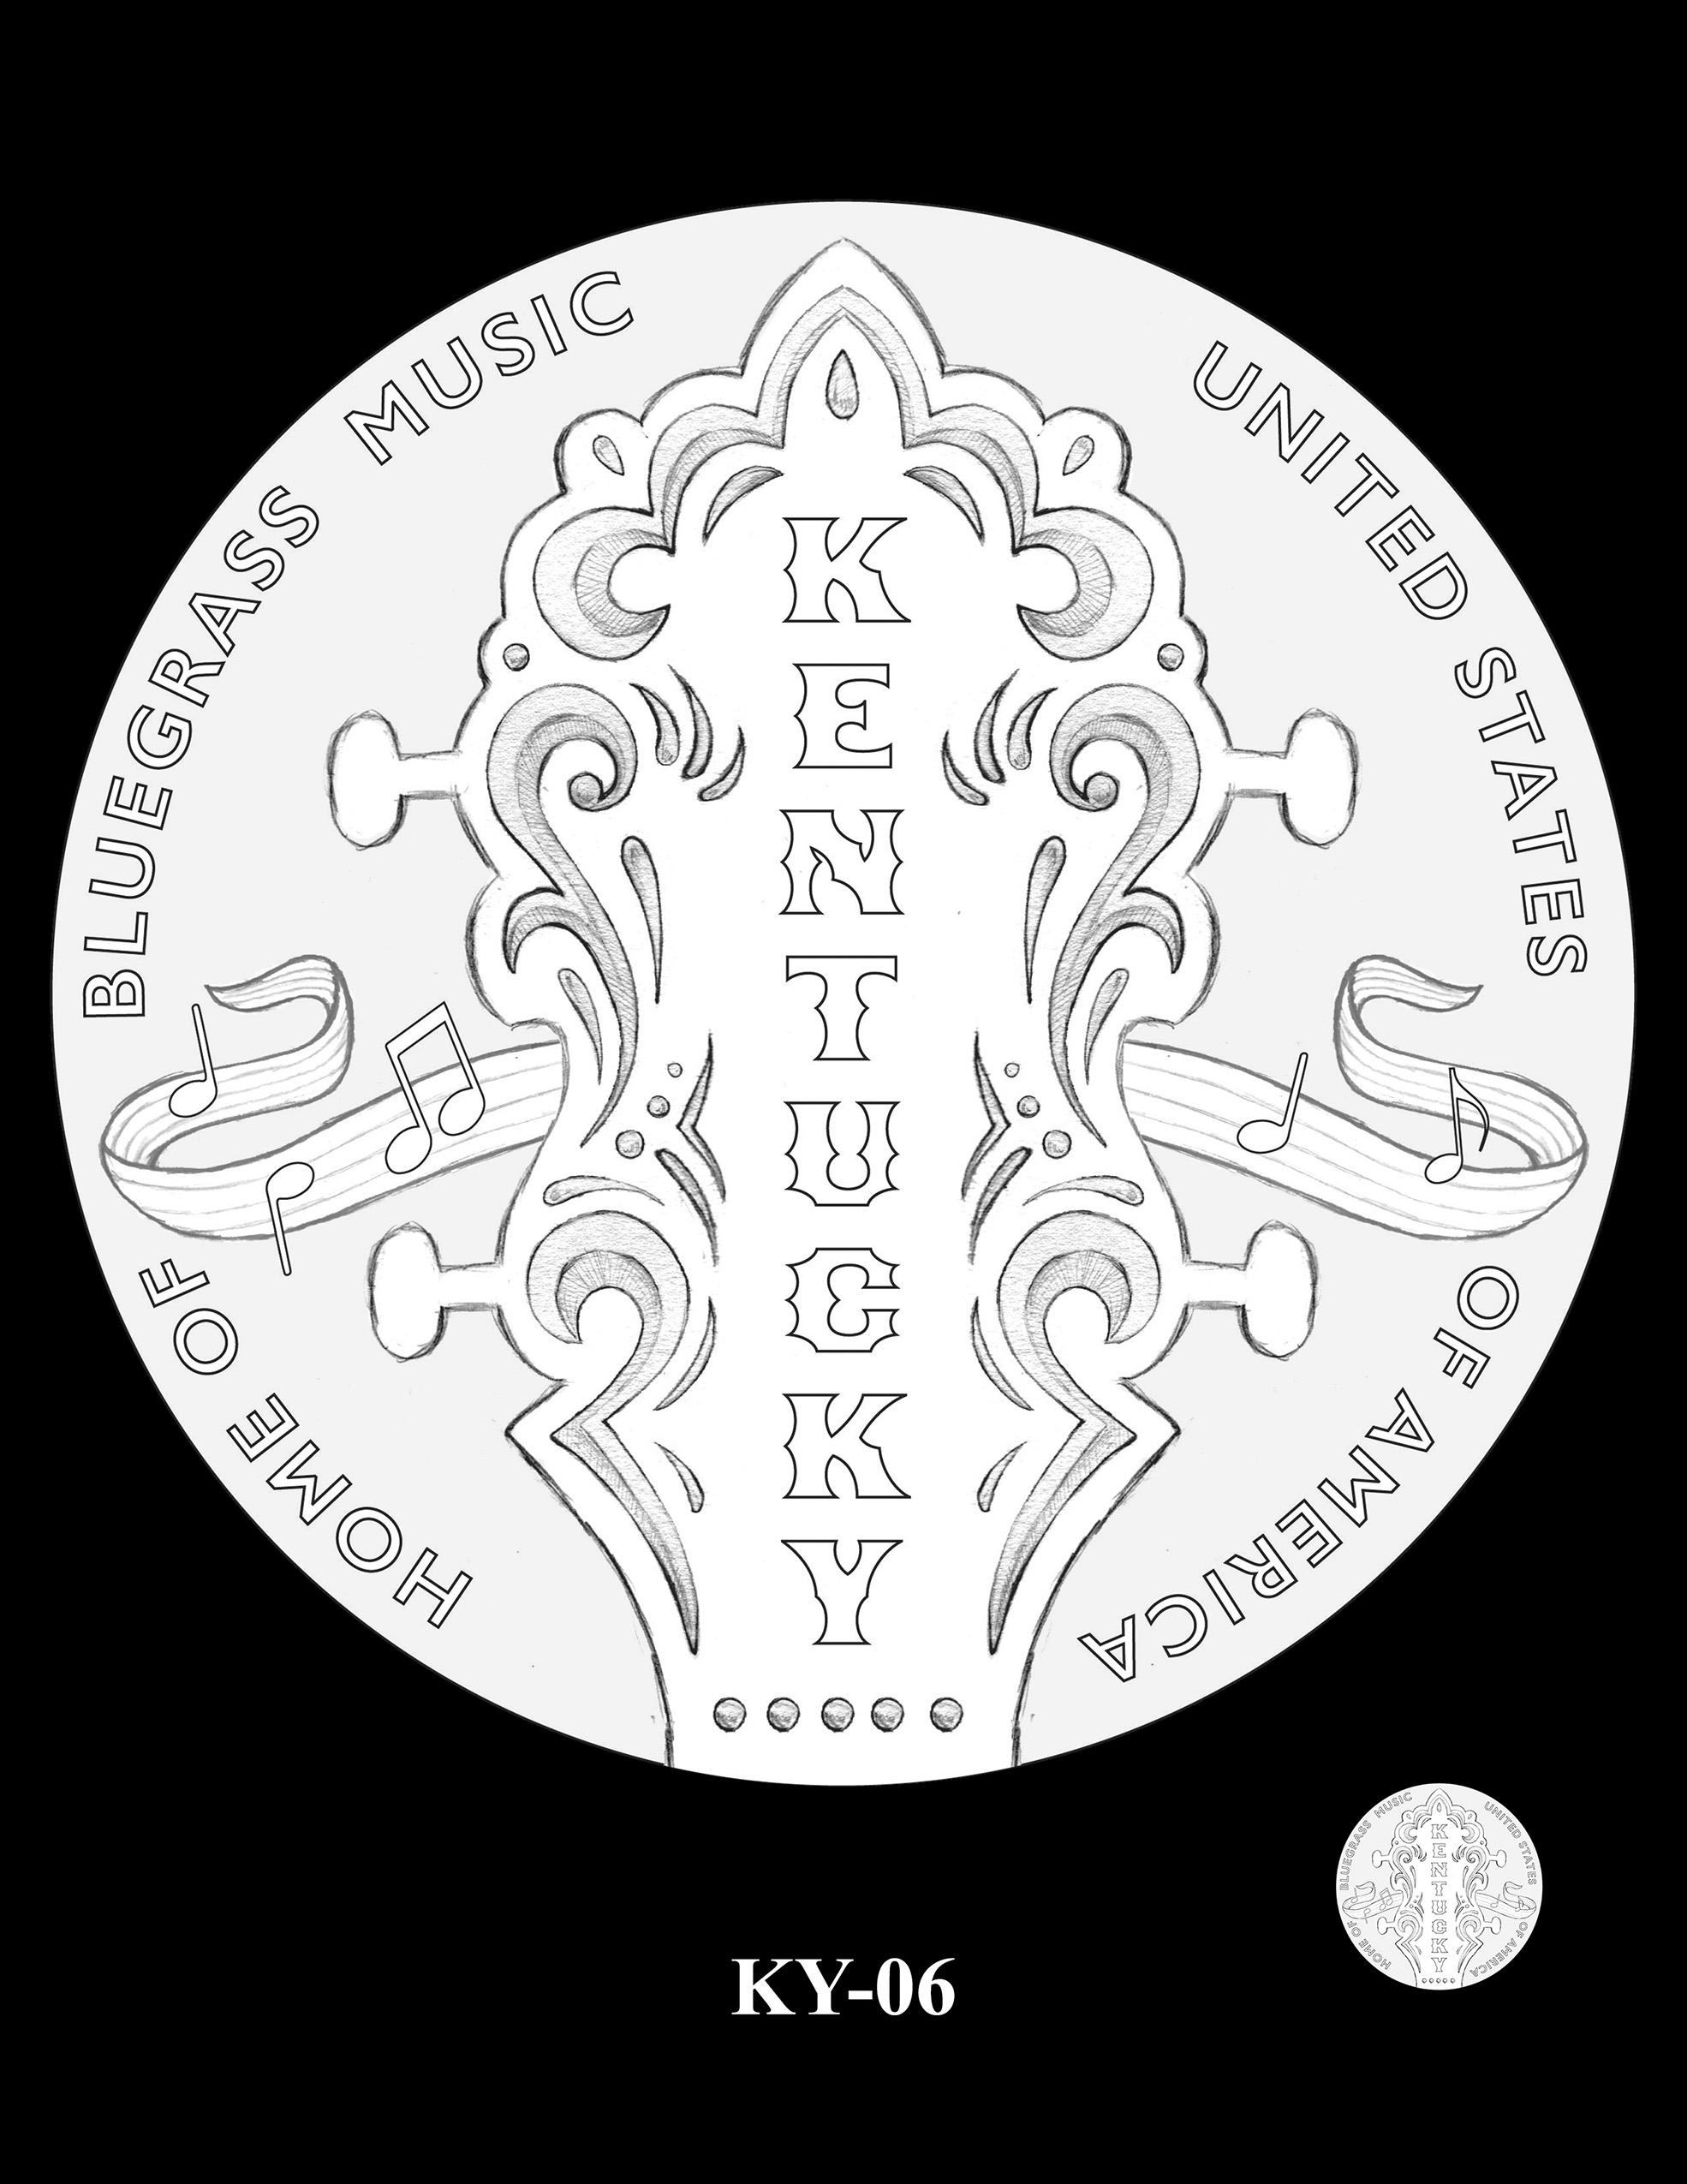 KY-06 -- 2022 American Innovation $1 Coin - Kentucky